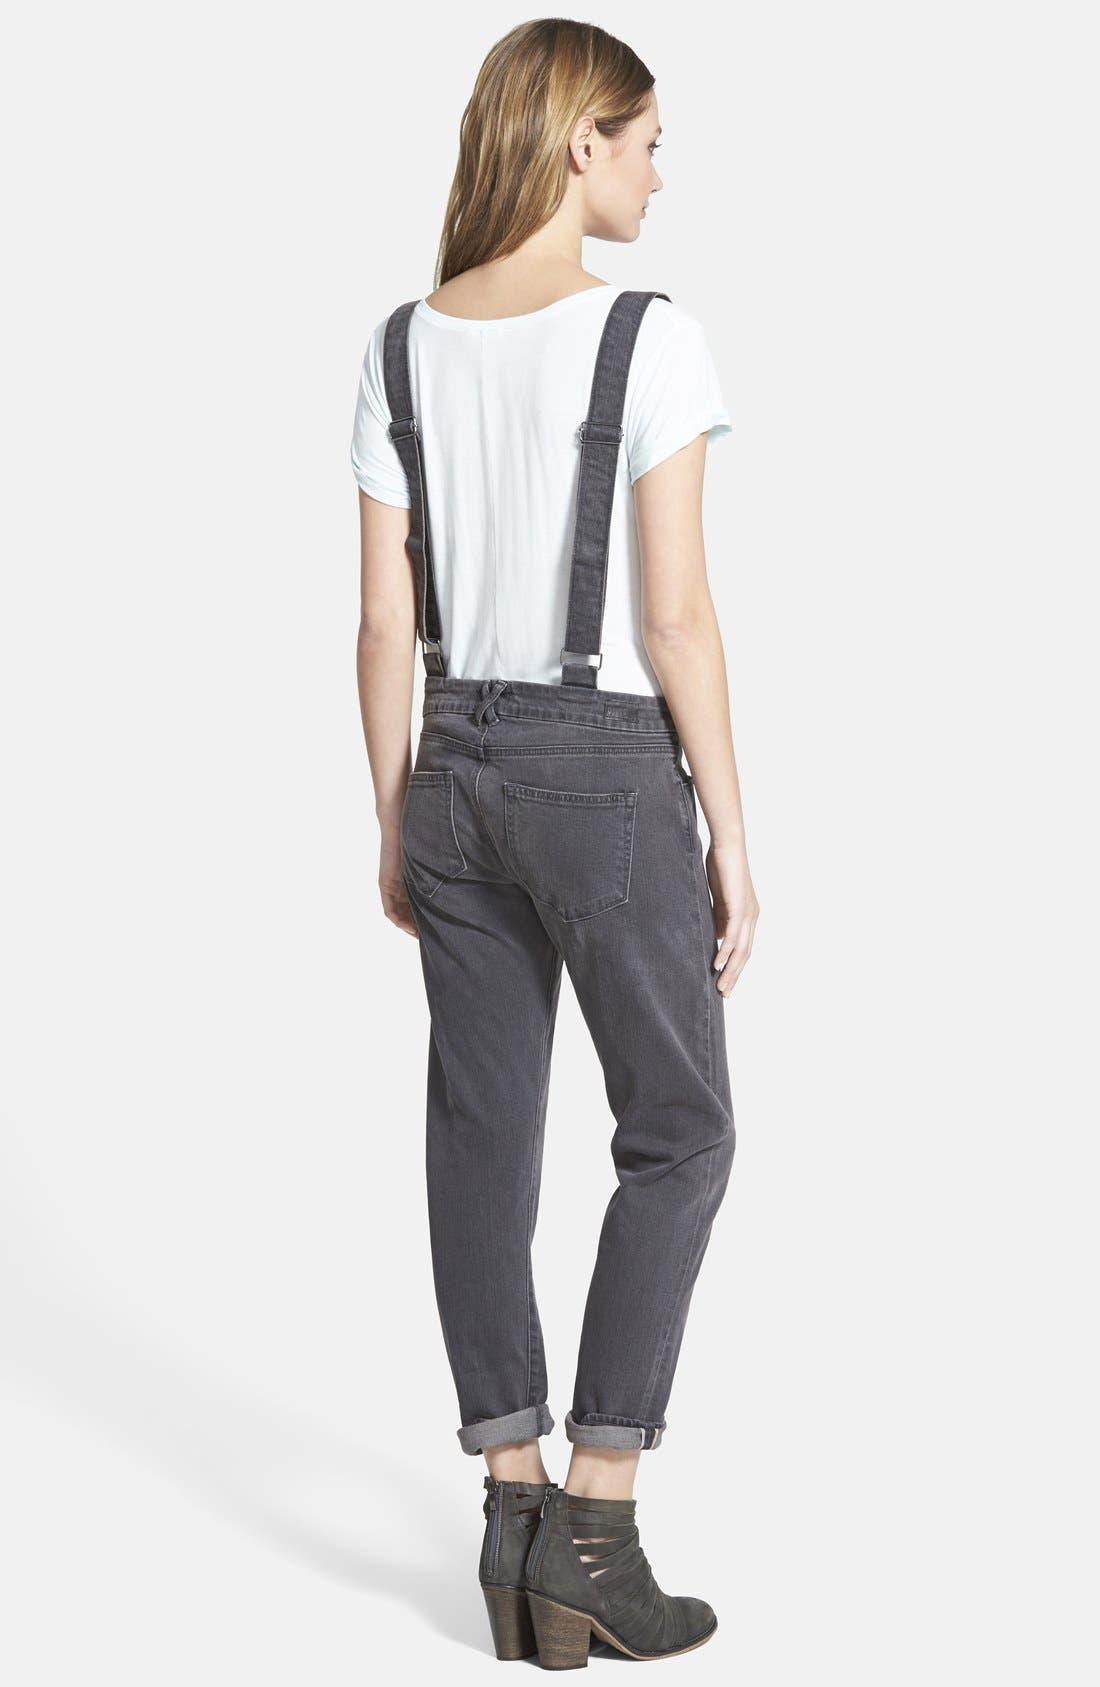 Alternate Image 2  - Paige Denim 'Phillipa' Boyfriend Jeans with Suspenders (Rudy)